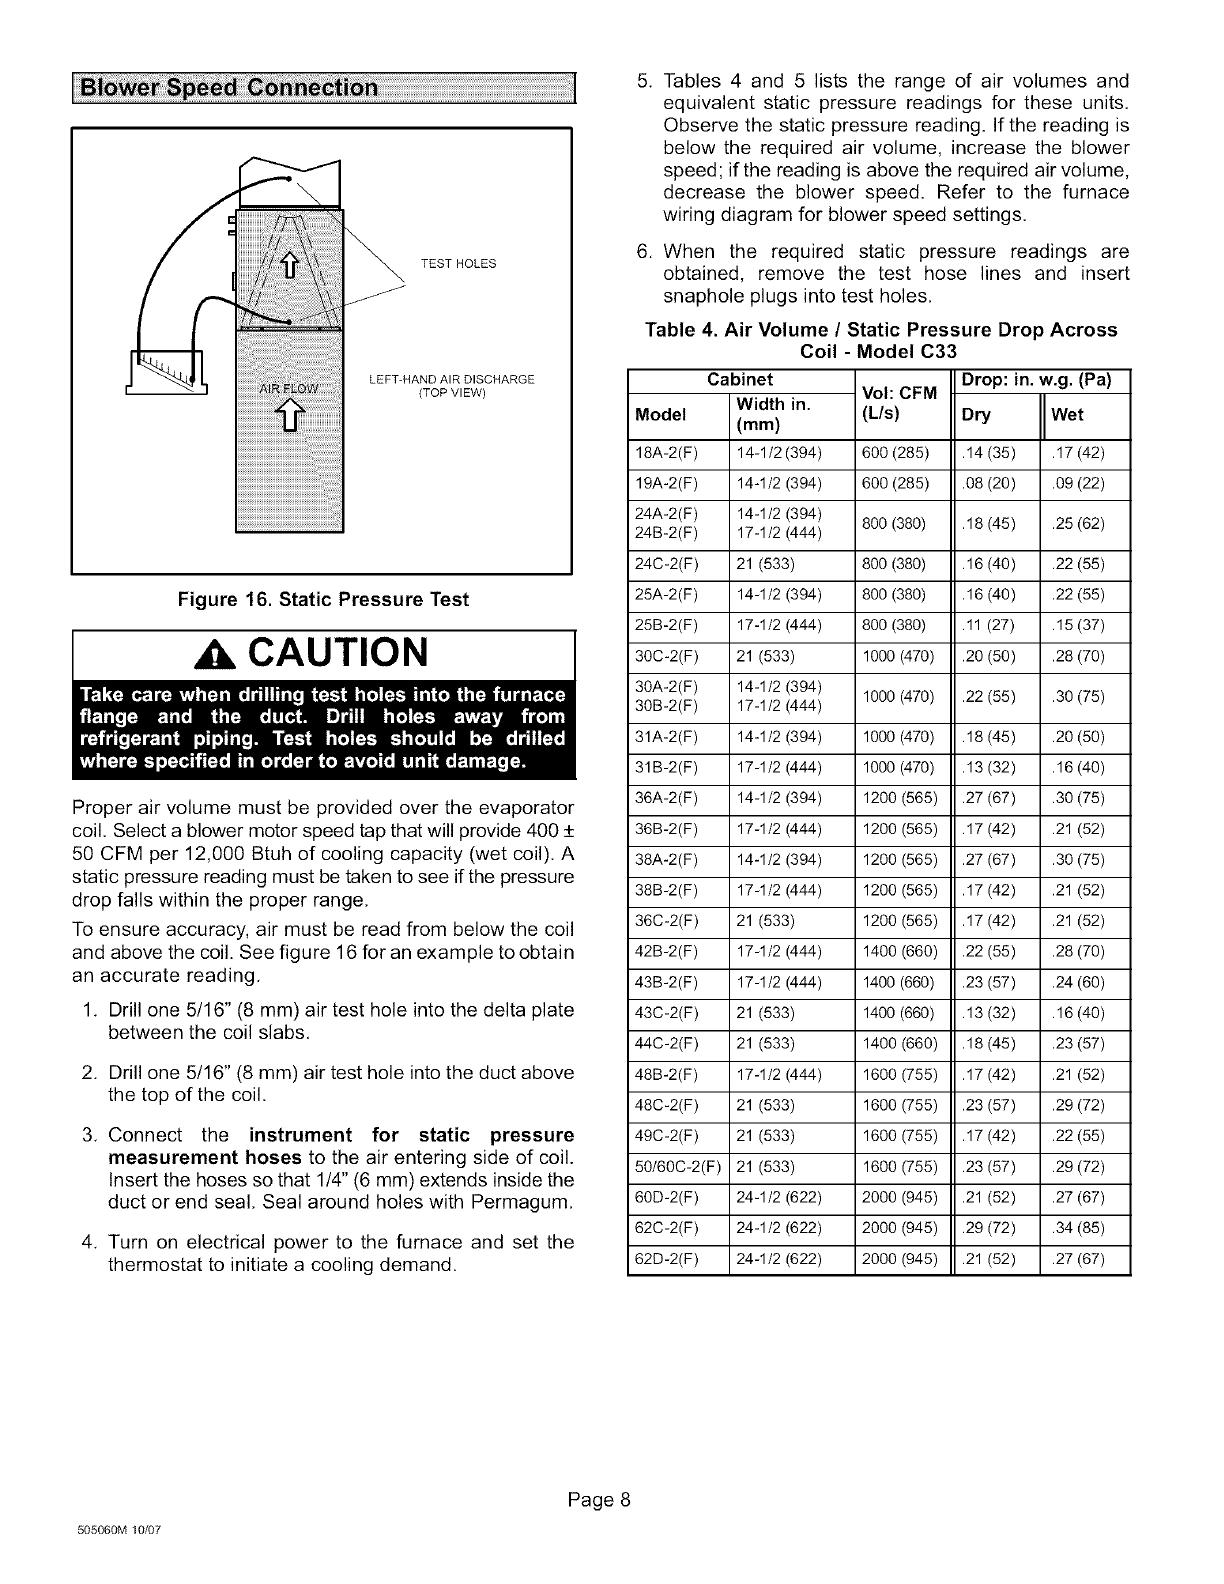 LENNOX Evaporator Coils Manual L0806270